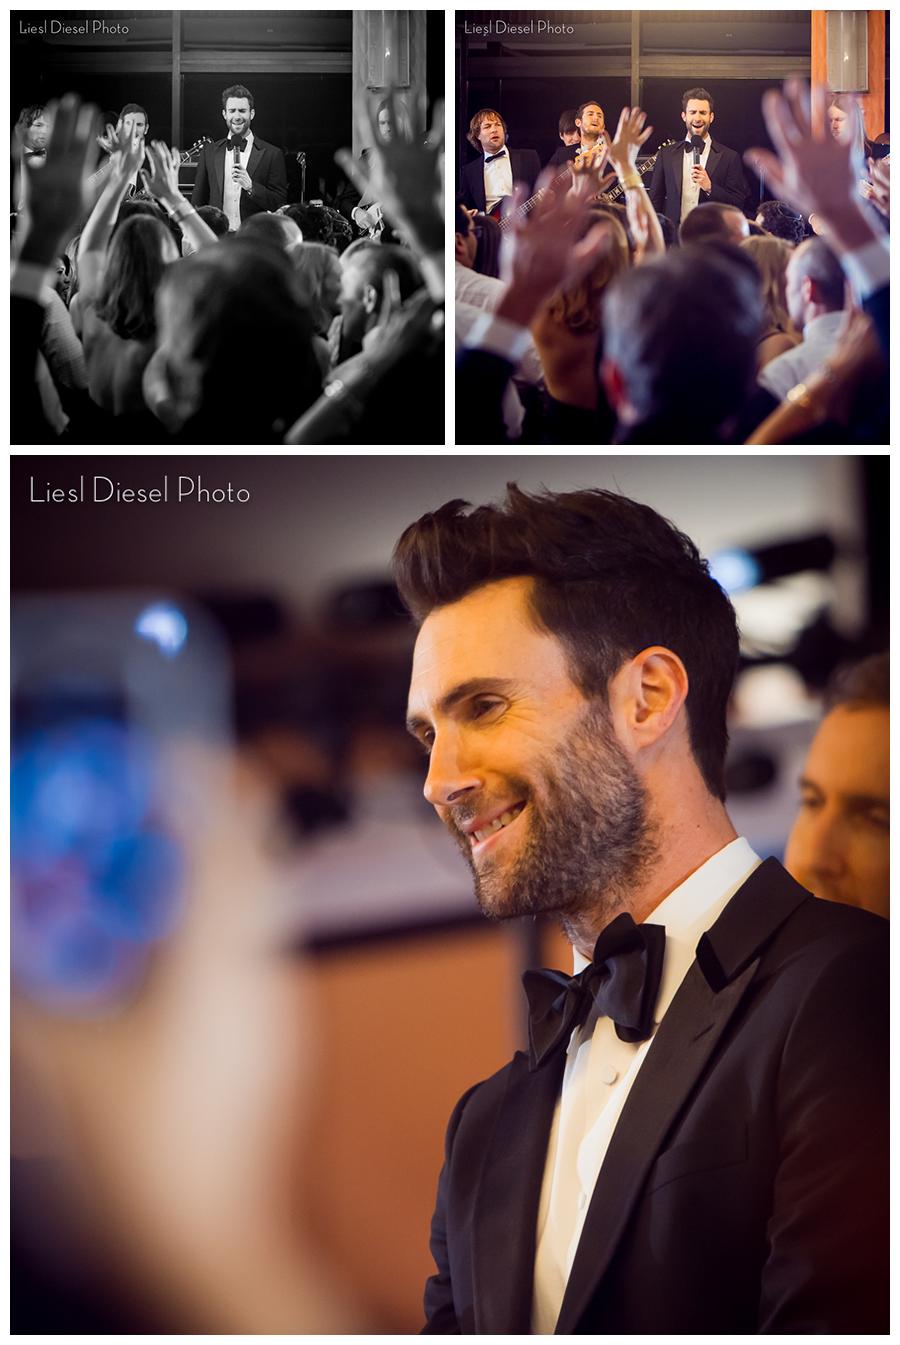 Adam Levine And Maroon 5 Crash A Wedding For A Music Video Adam Levine Levine Maroon 5